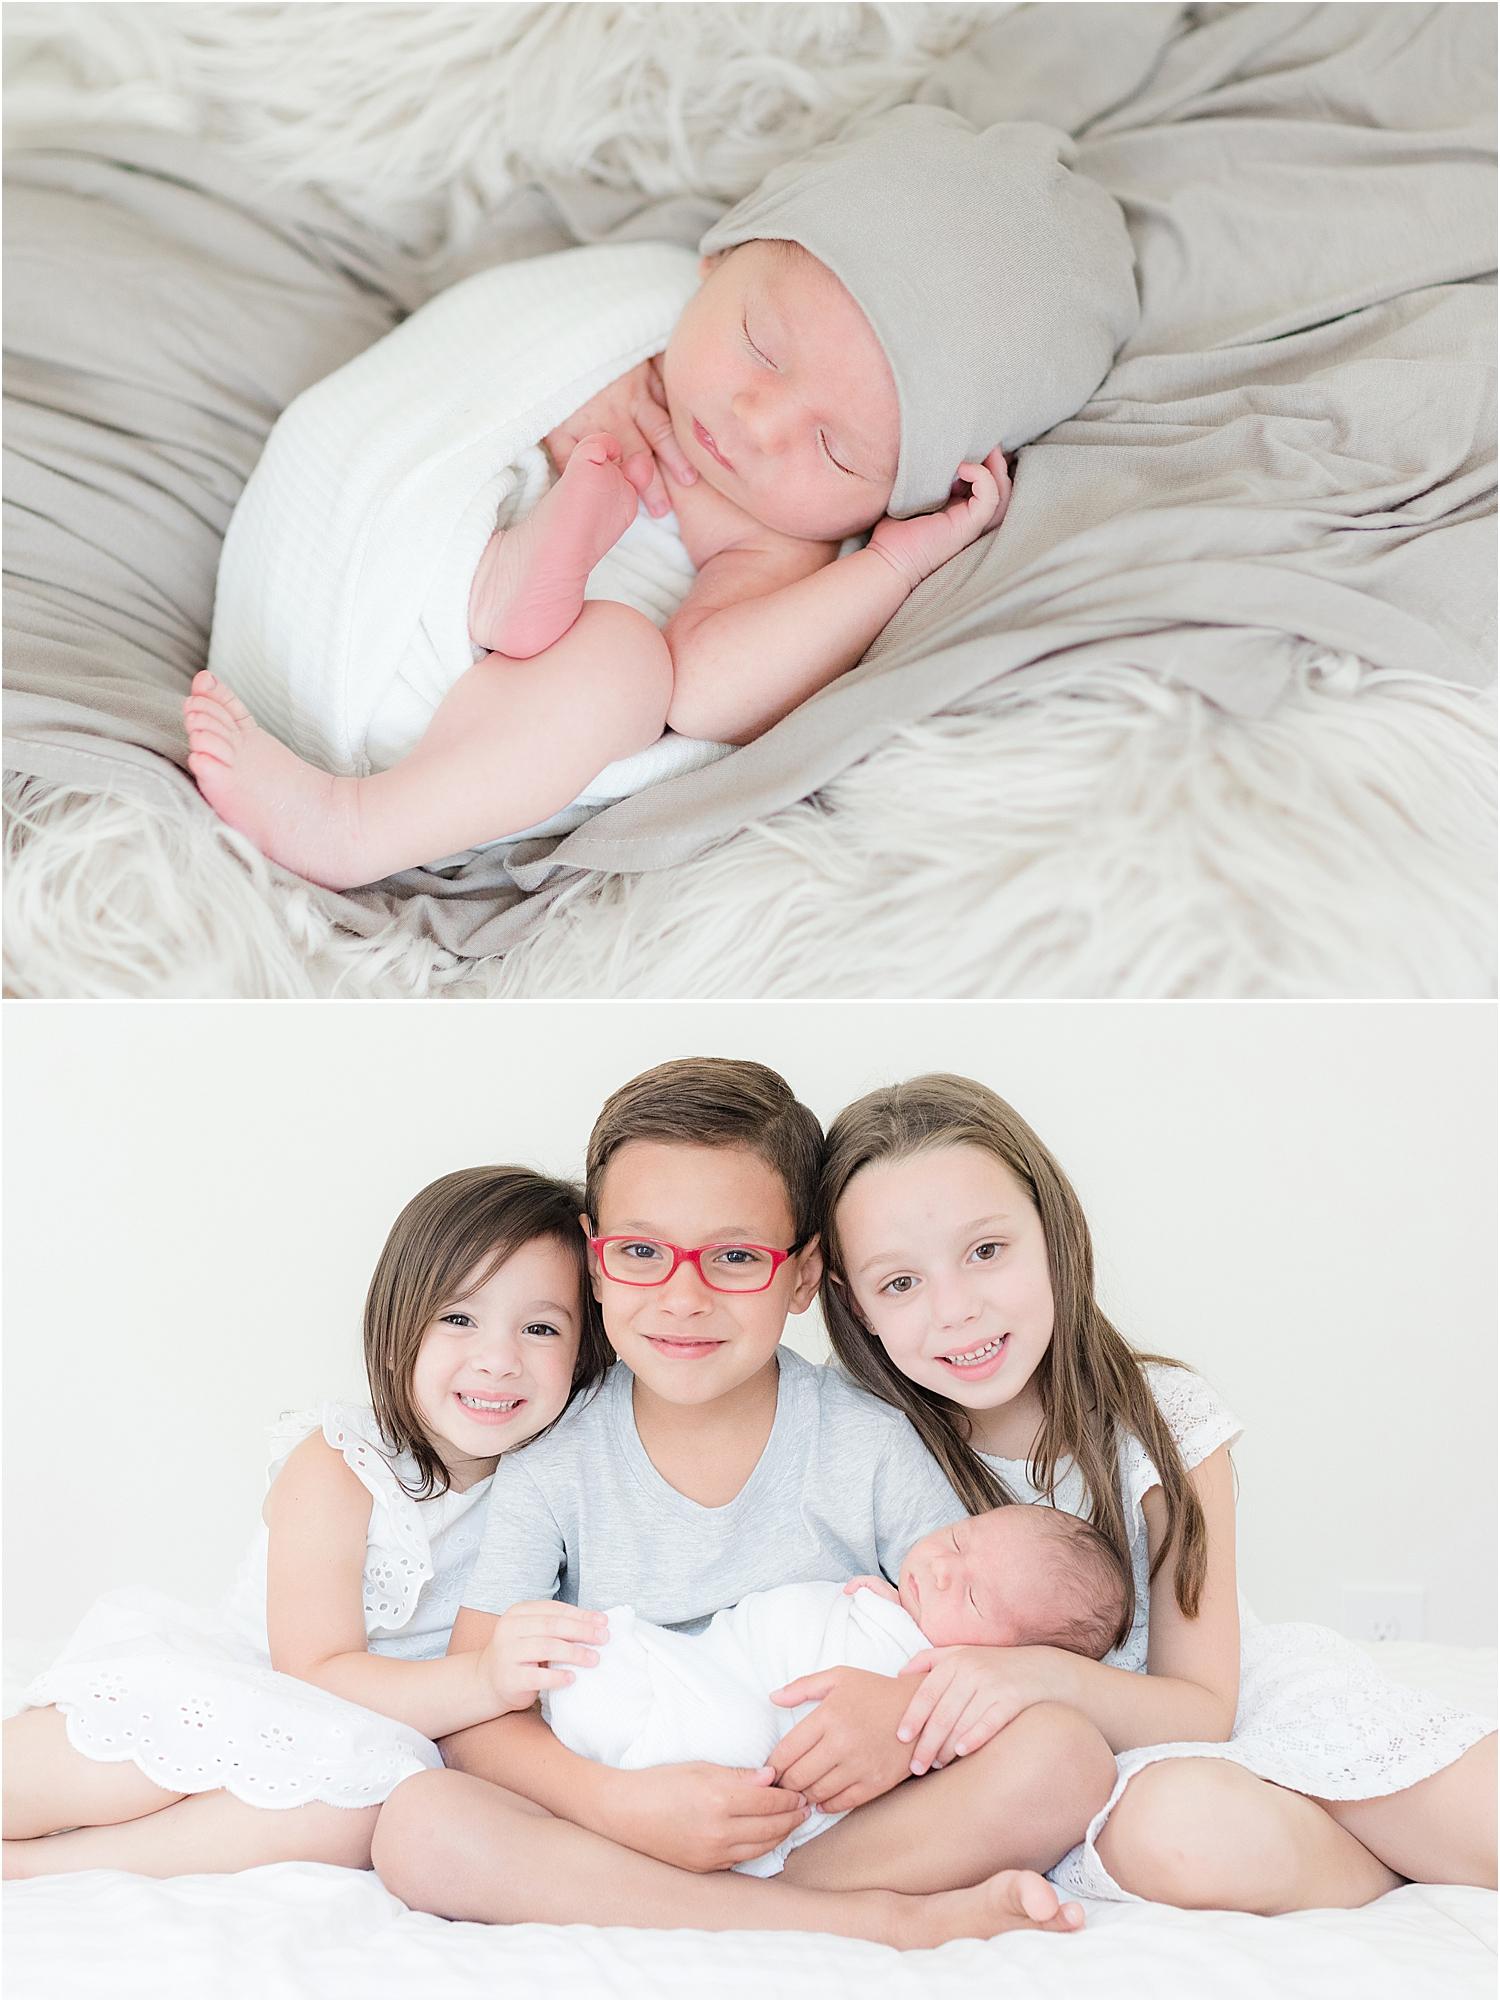 natural sibling and newborn photo in nj